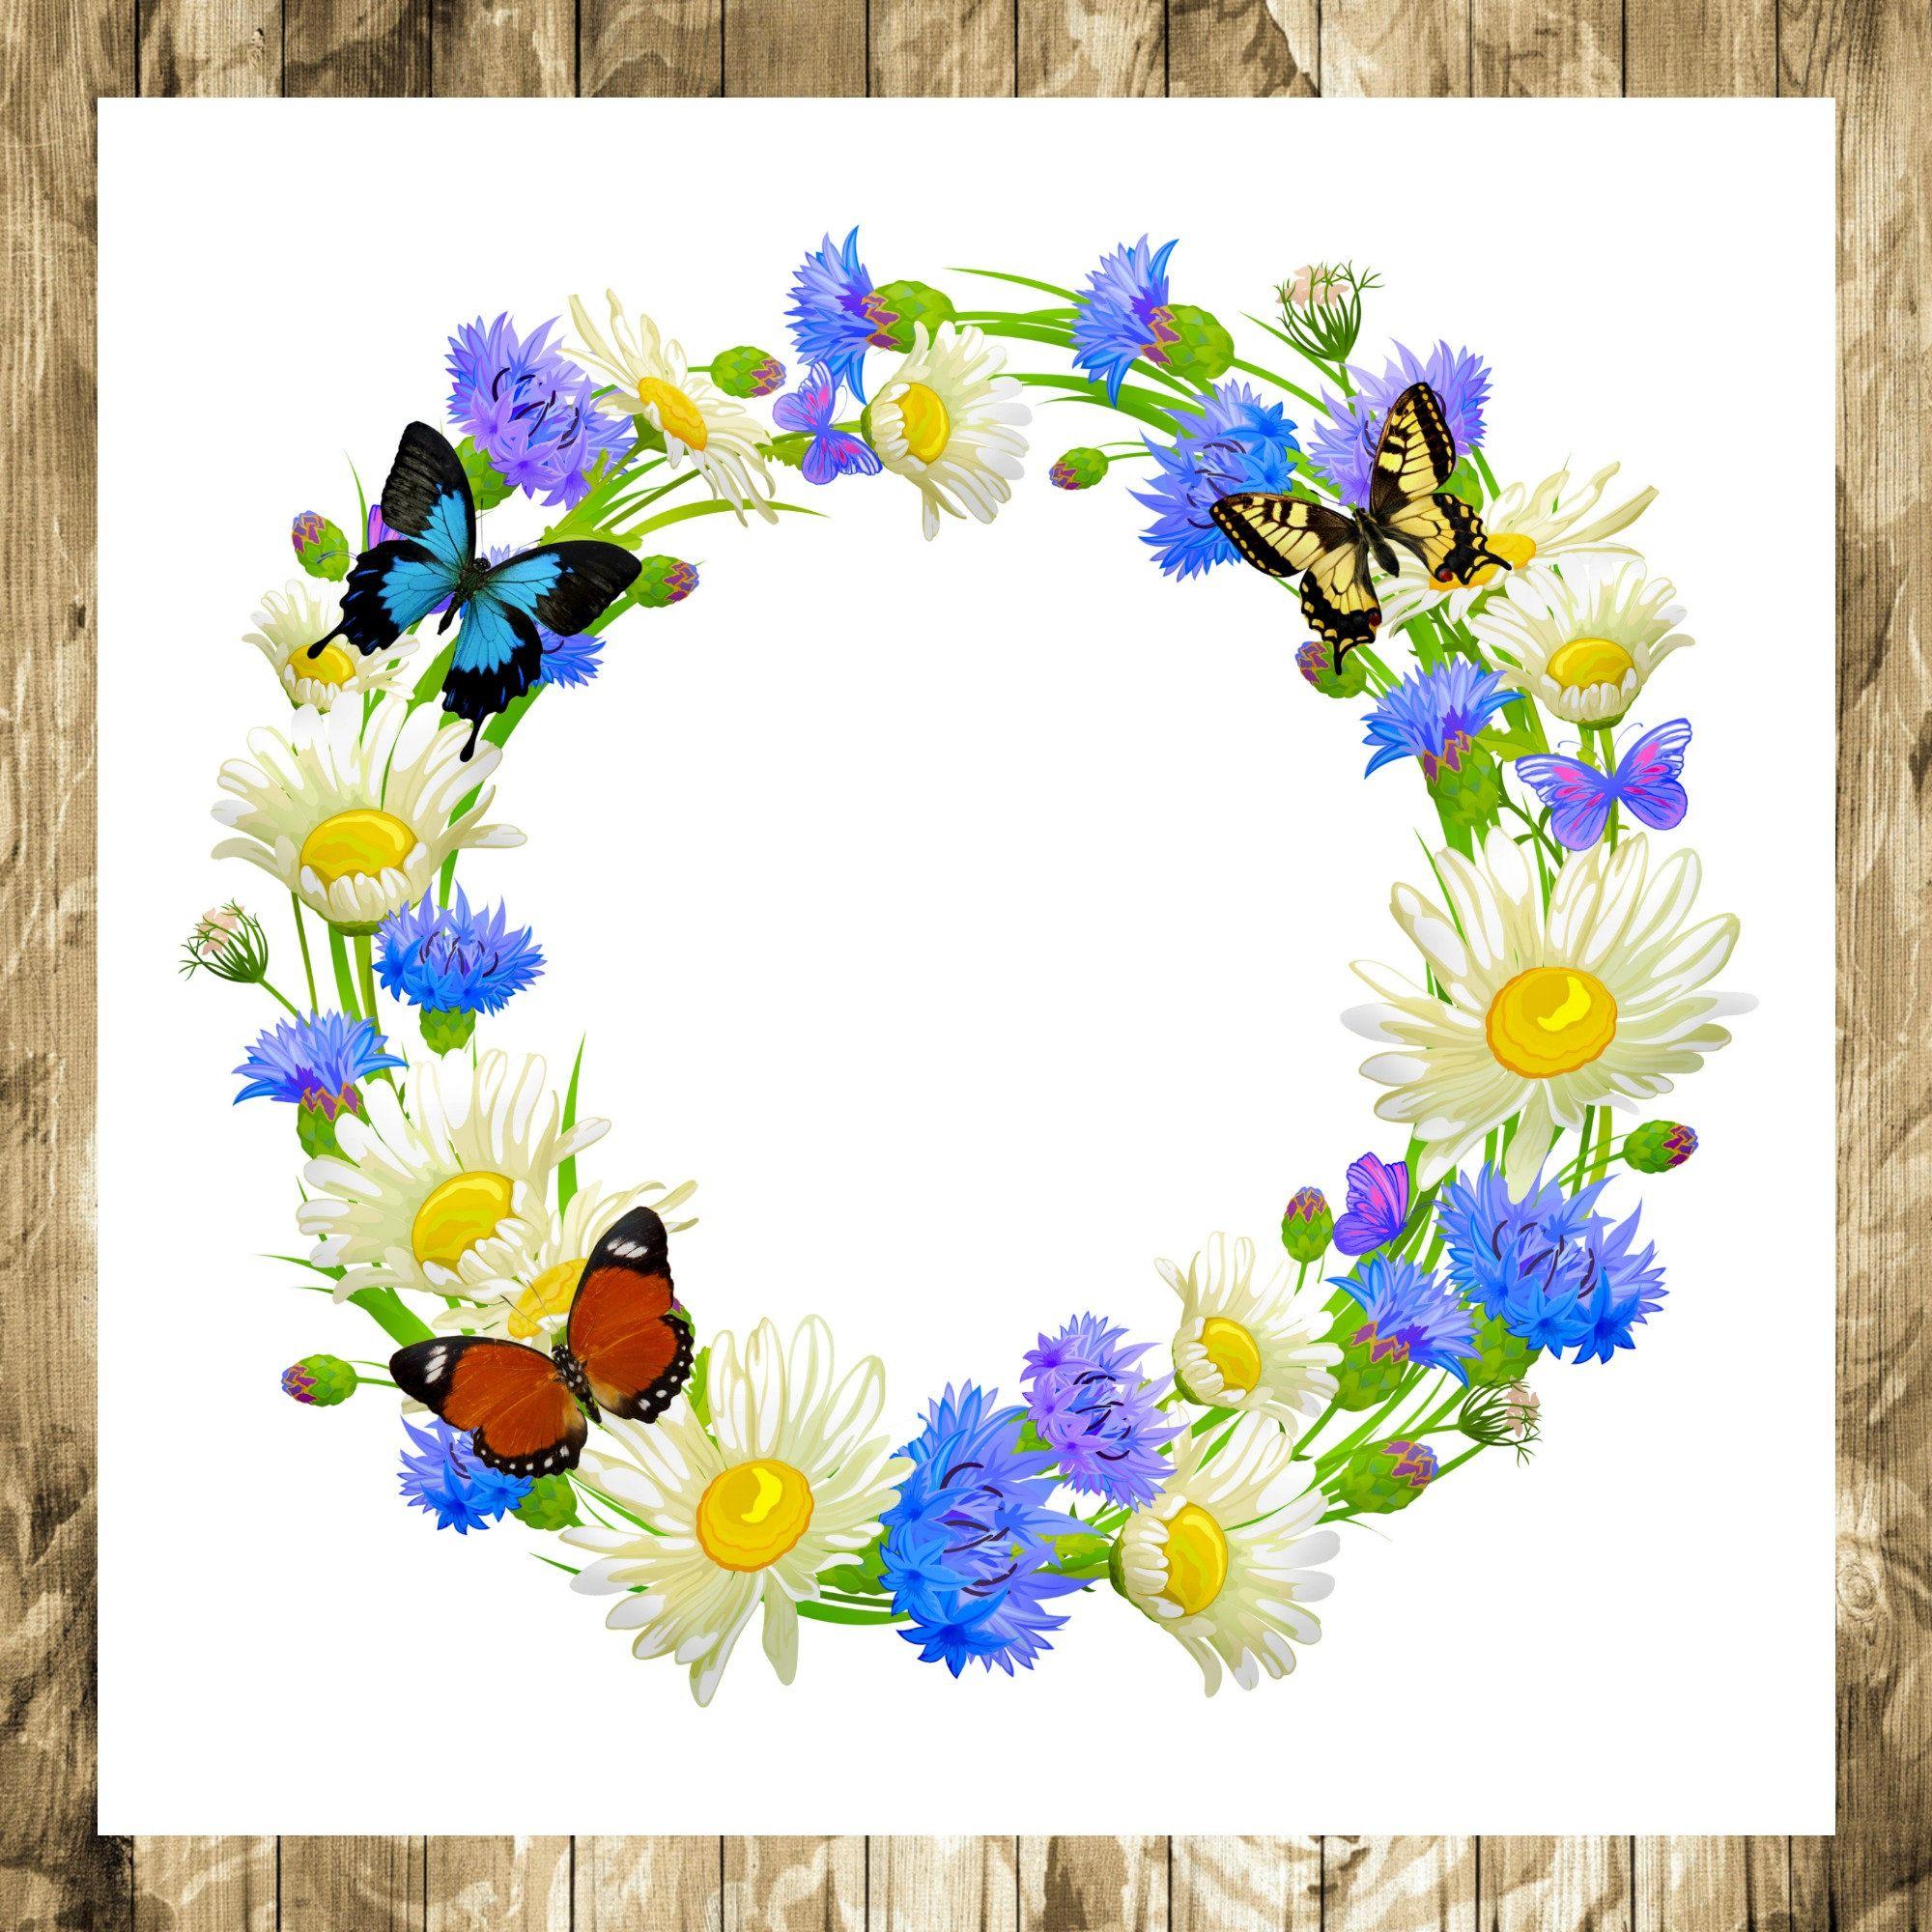 Photo of Schmetterlingsillustration – Blumenillustration – Schmetterlingskranz – Blumenkranz – Blumen – Schmetterling – Kranz – Illustration – Druckbar